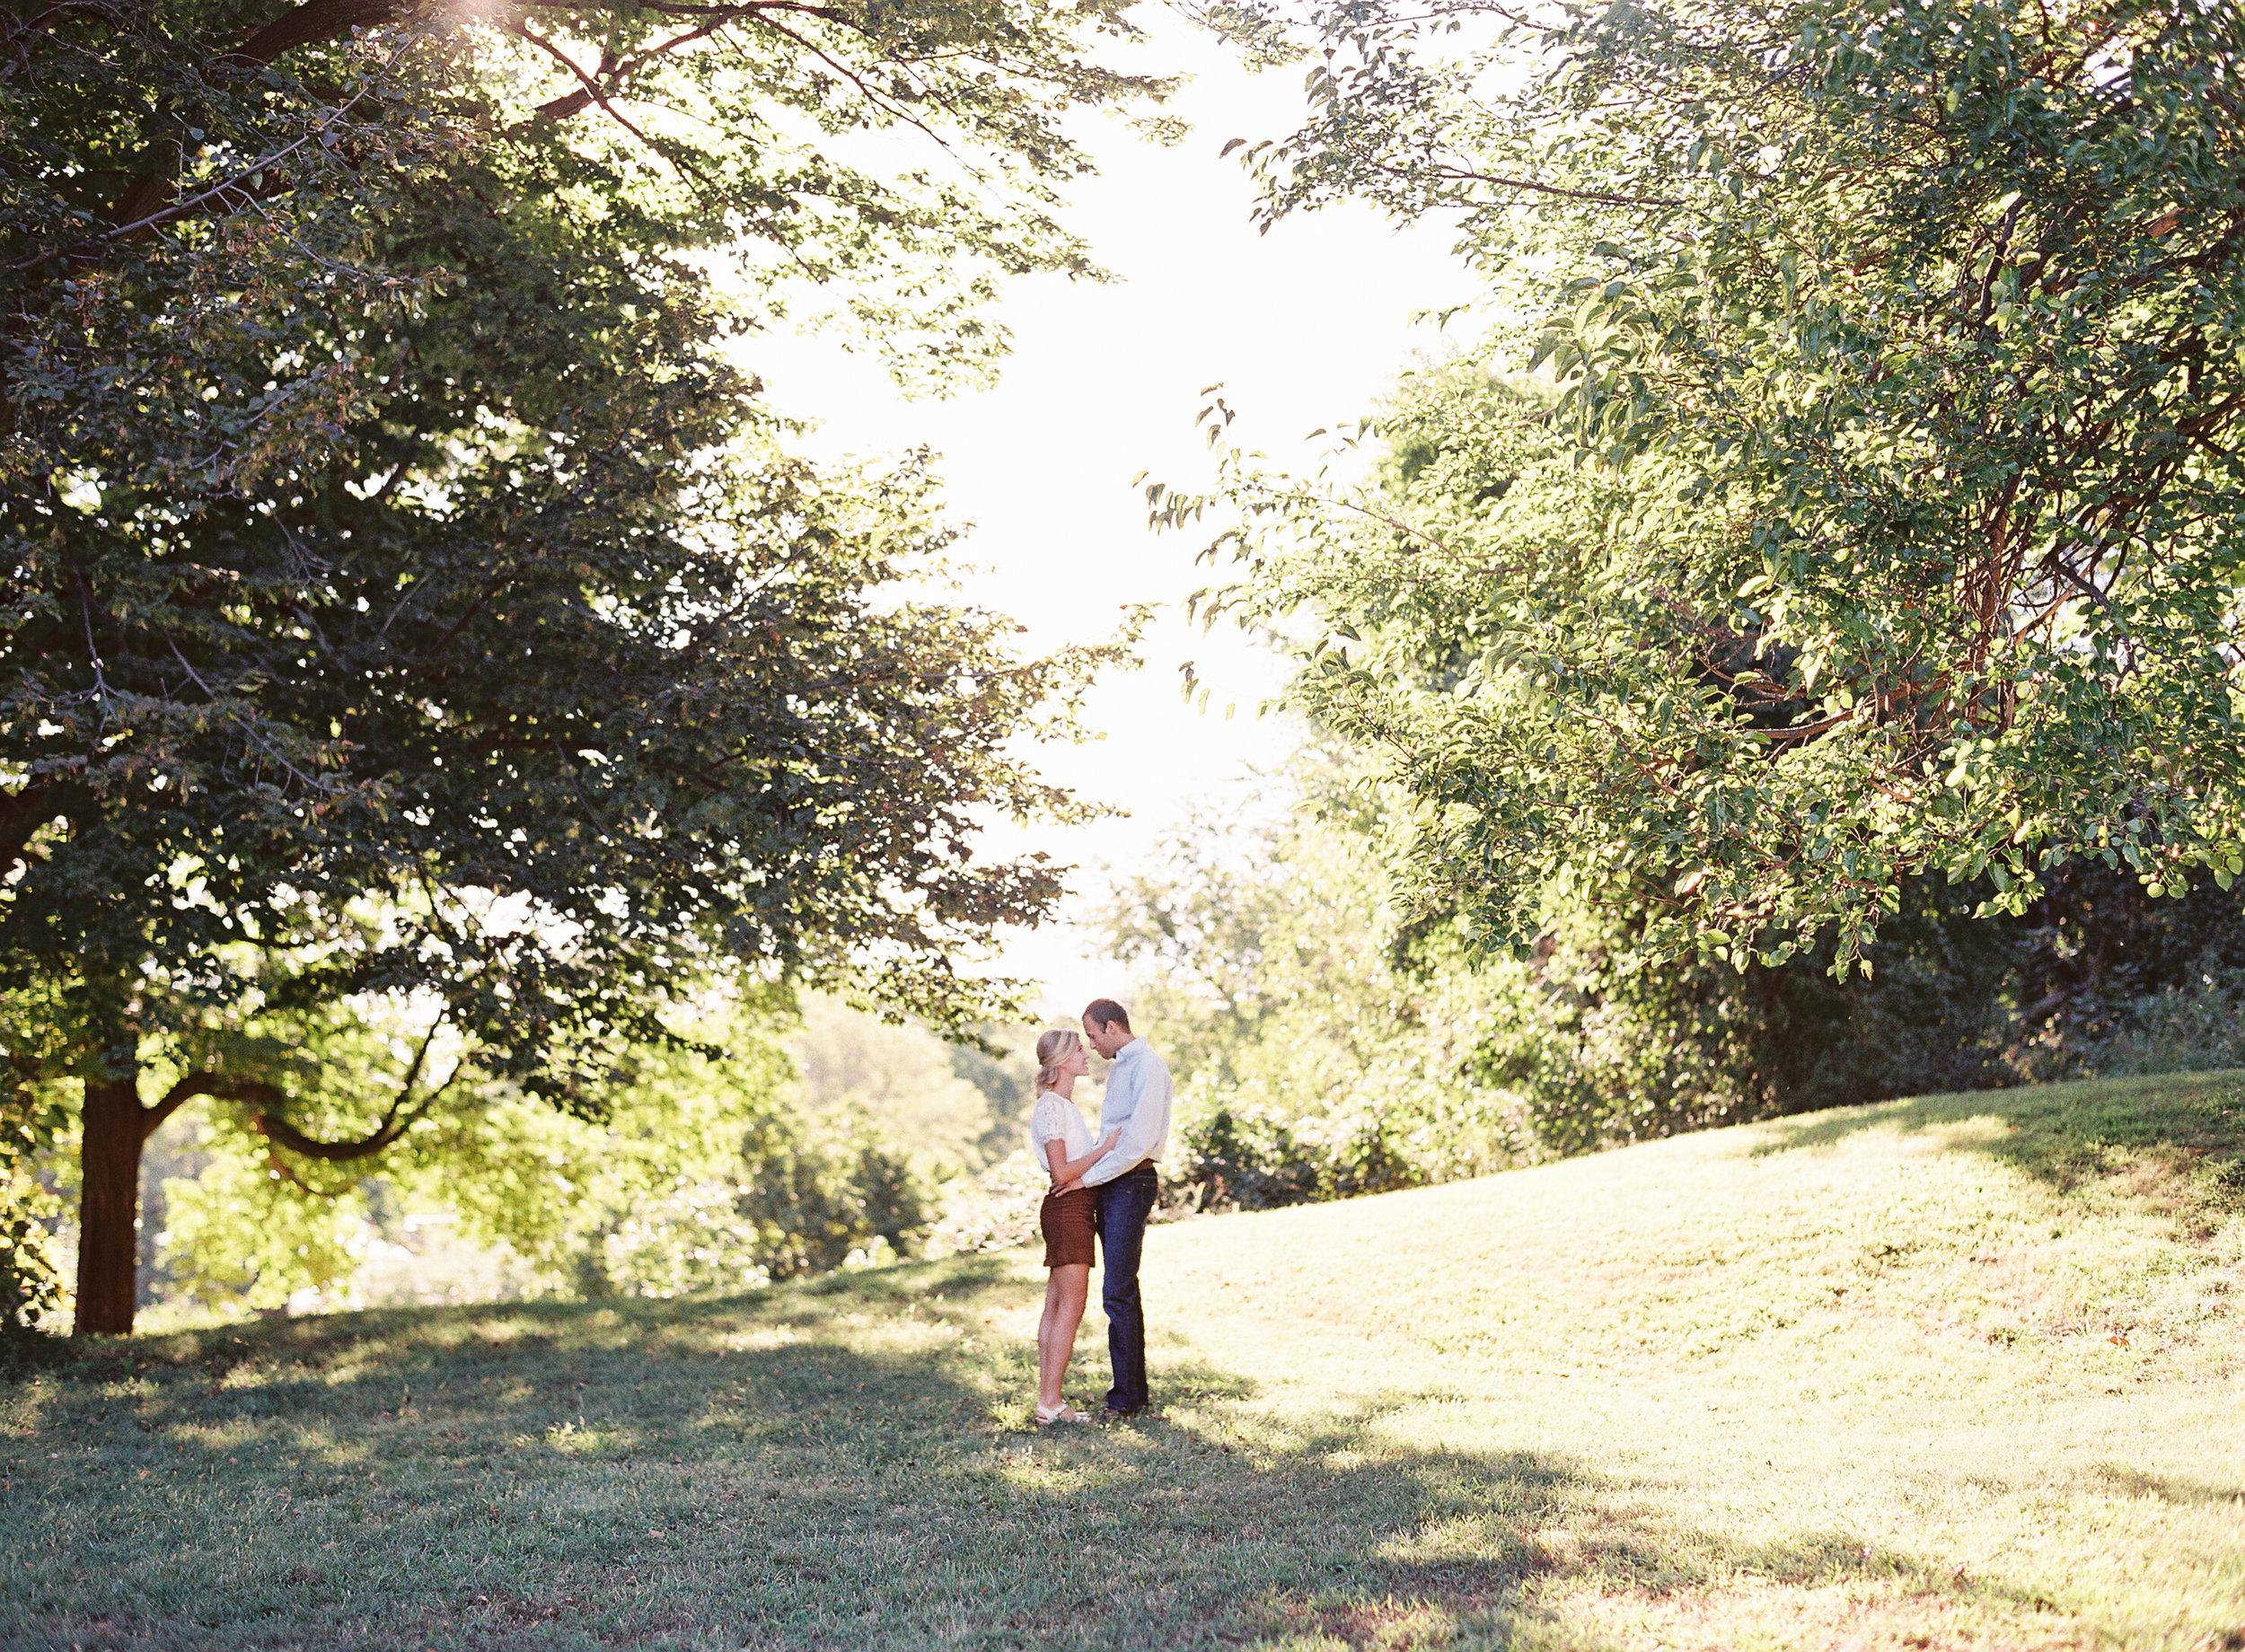 Meghan Mehan Photography | Fine Art Film Wedding Photographer | California | San Francisco | Napa | Sonoma | Santa Barbara | Big Sur | Los Angeles | Destination Wedding Photographer 018.jpg